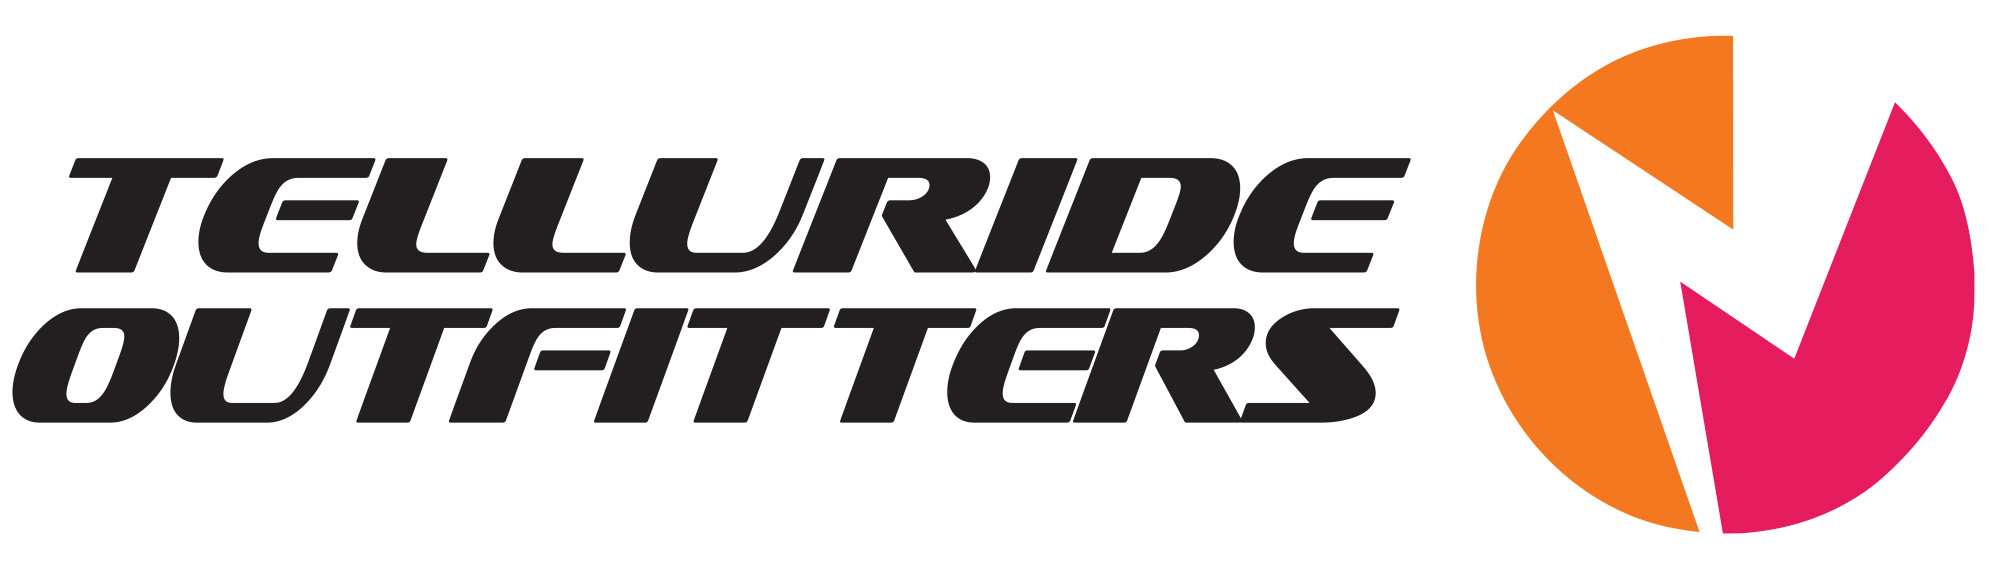 Telluride Outfitters horz logo.jpg